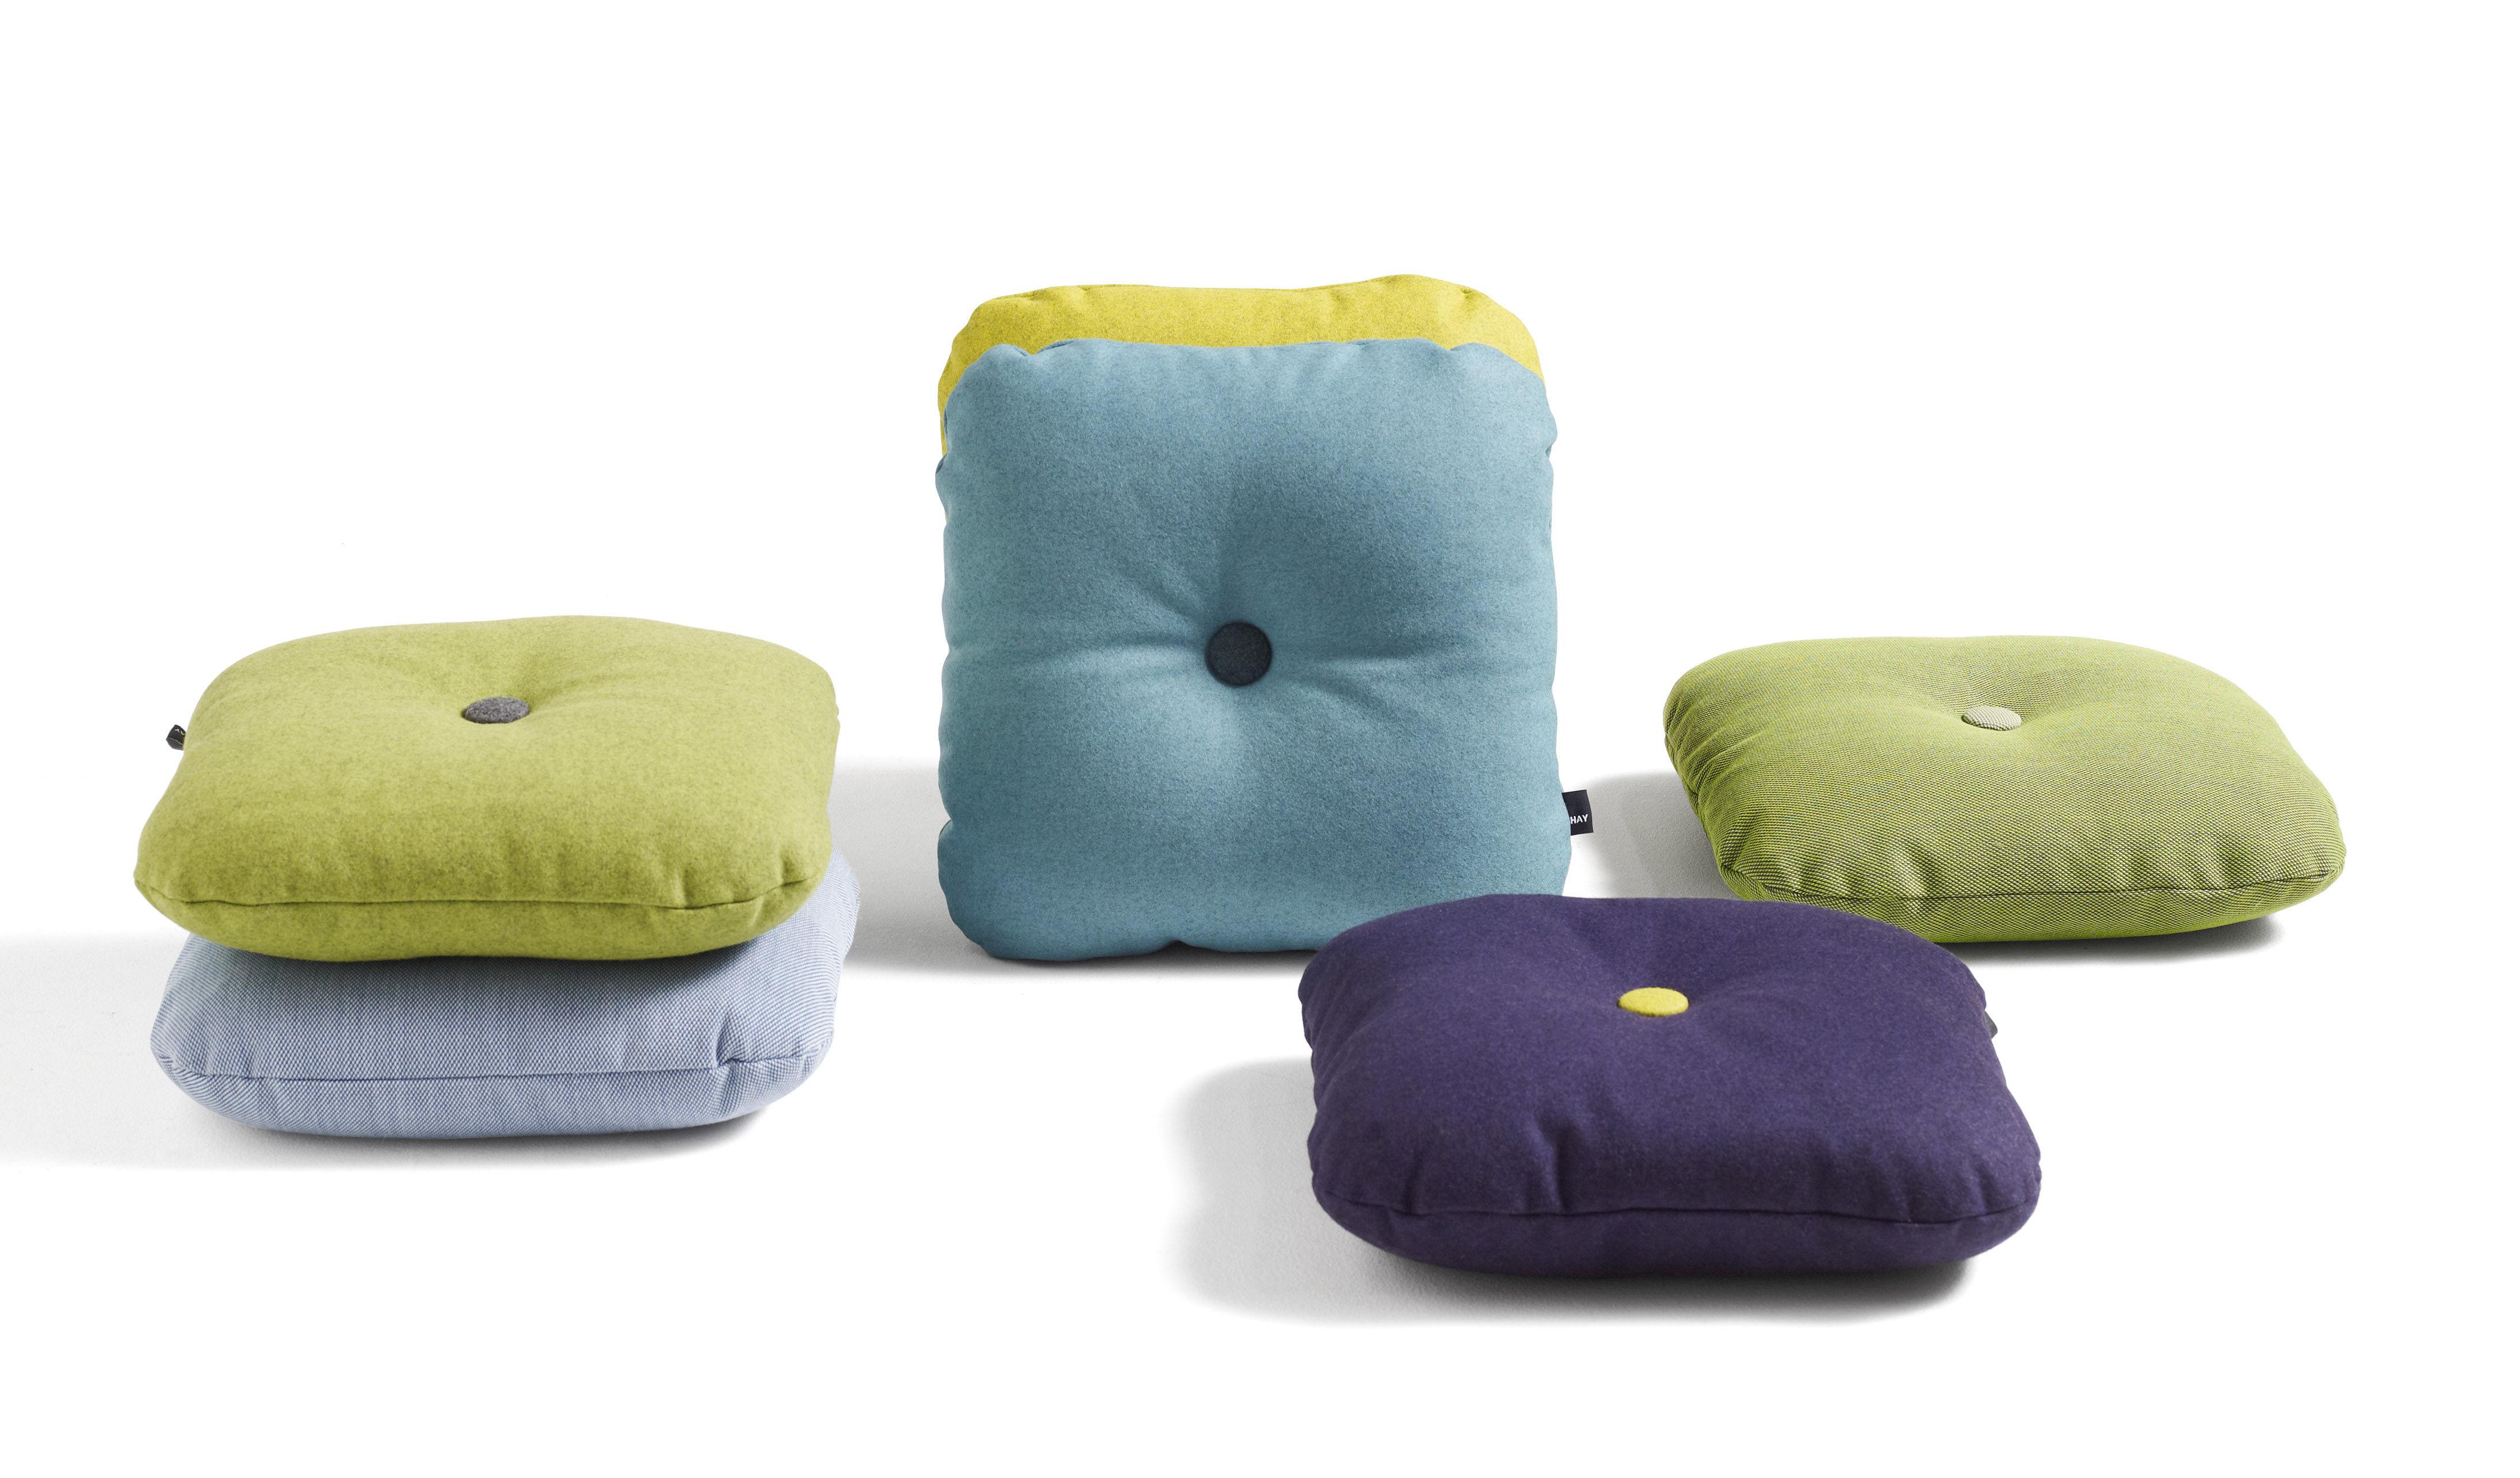 coussin dot divina 50 x 50 cm vert d 39 eau boutons vert fonc jaun hay. Black Bedroom Furniture Sets. Home Design Ideas